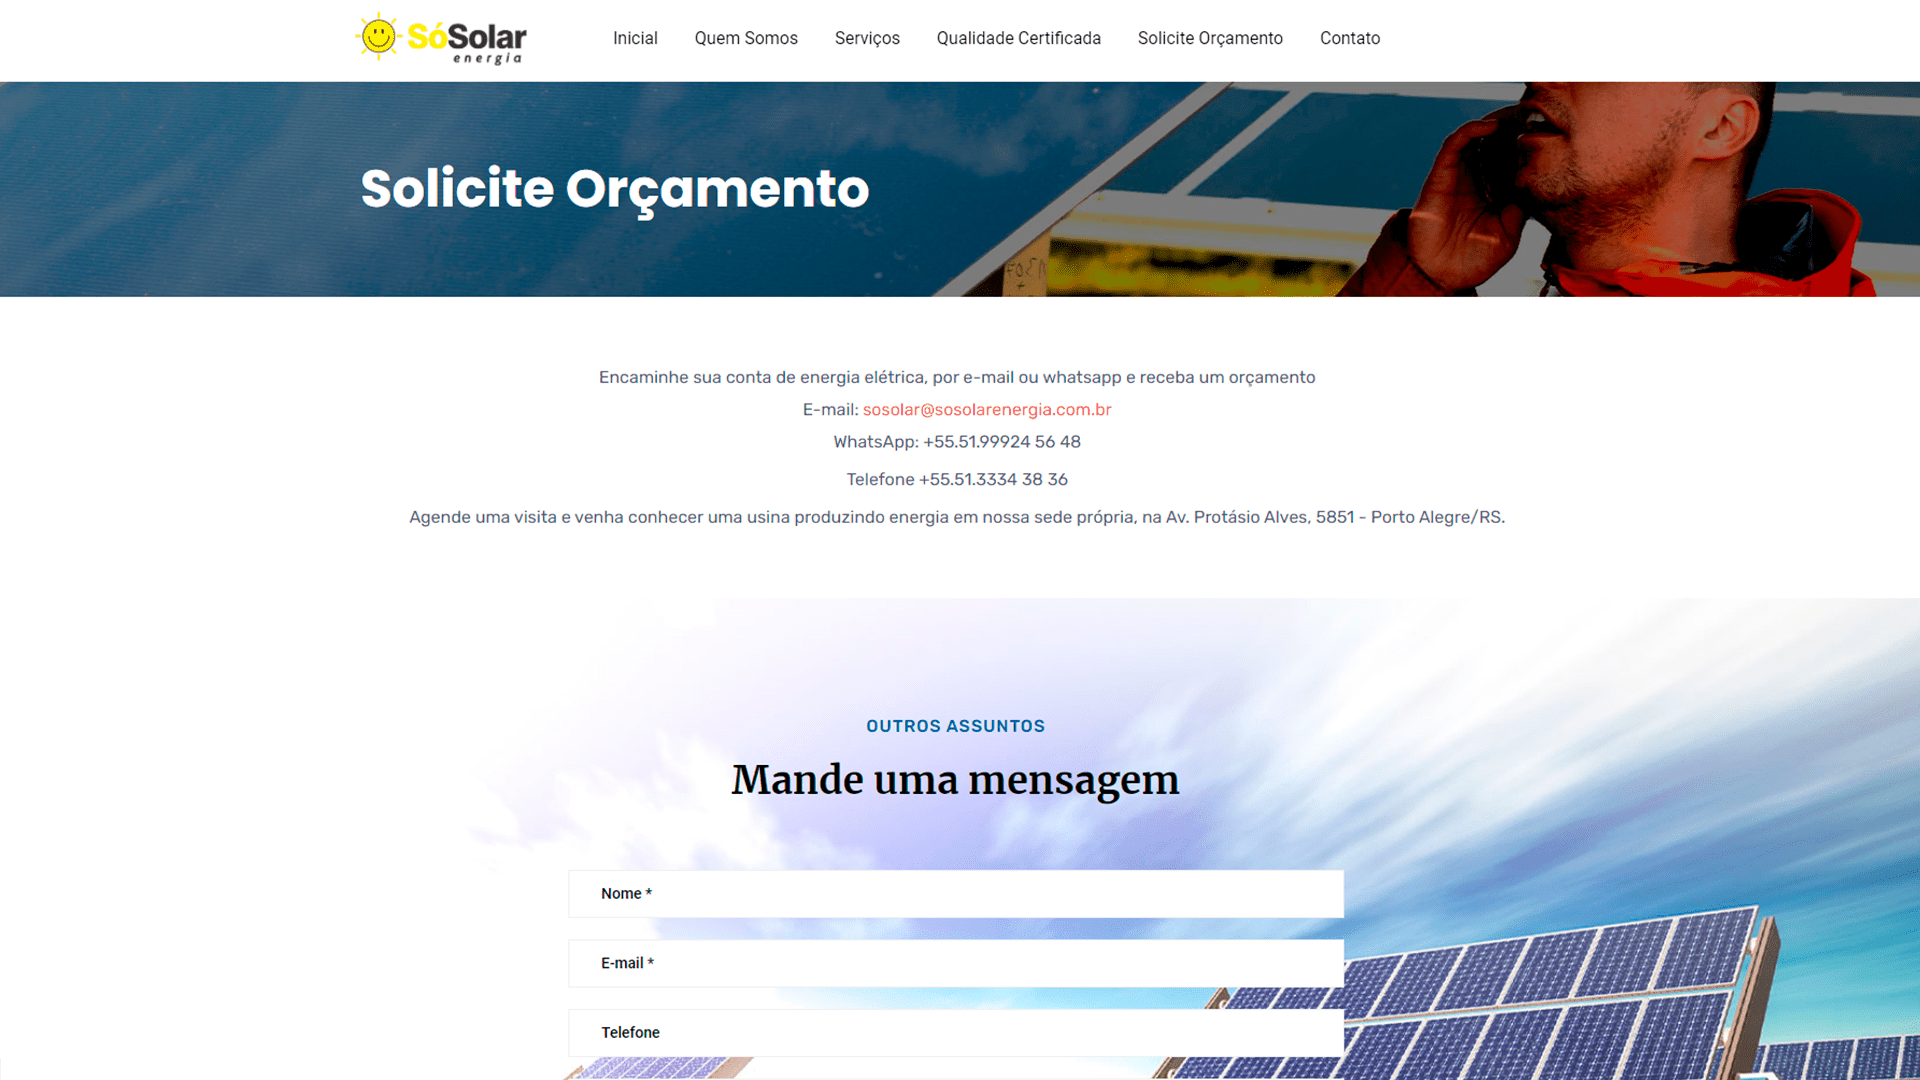 https://www.6i.com.br/case/sosolar-eneria/